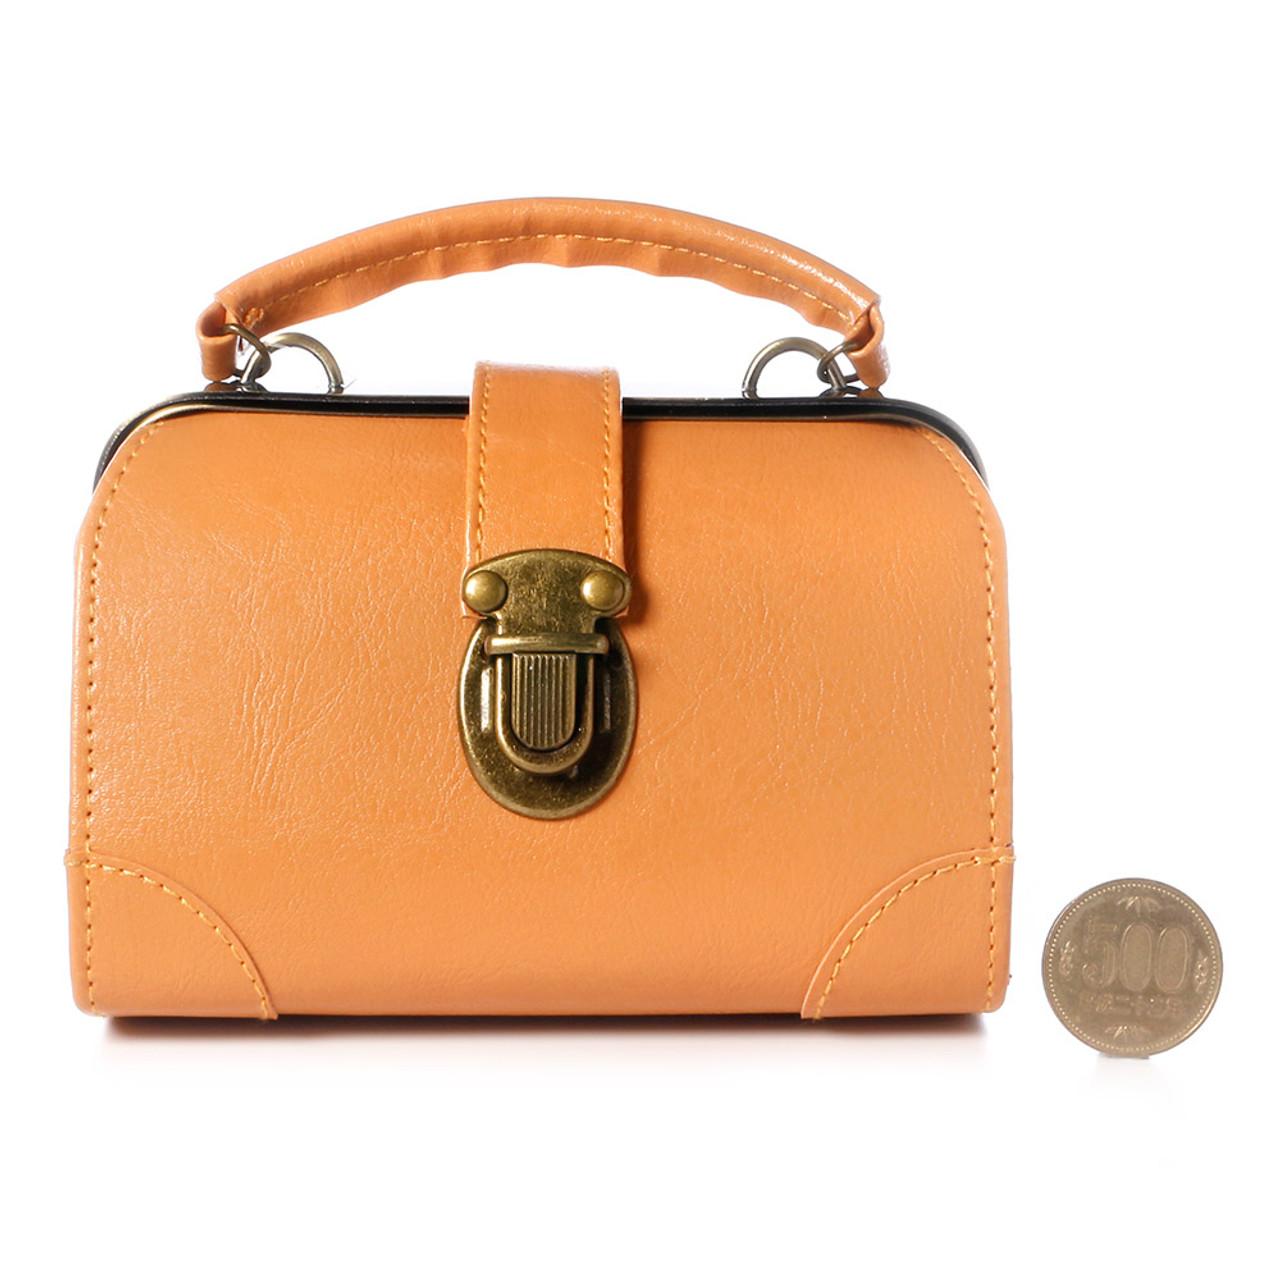 Seto Craft Motif Mini Doctor Bag Shape Pouch / Cosmetic Bag - Camel Color ( Proportion )